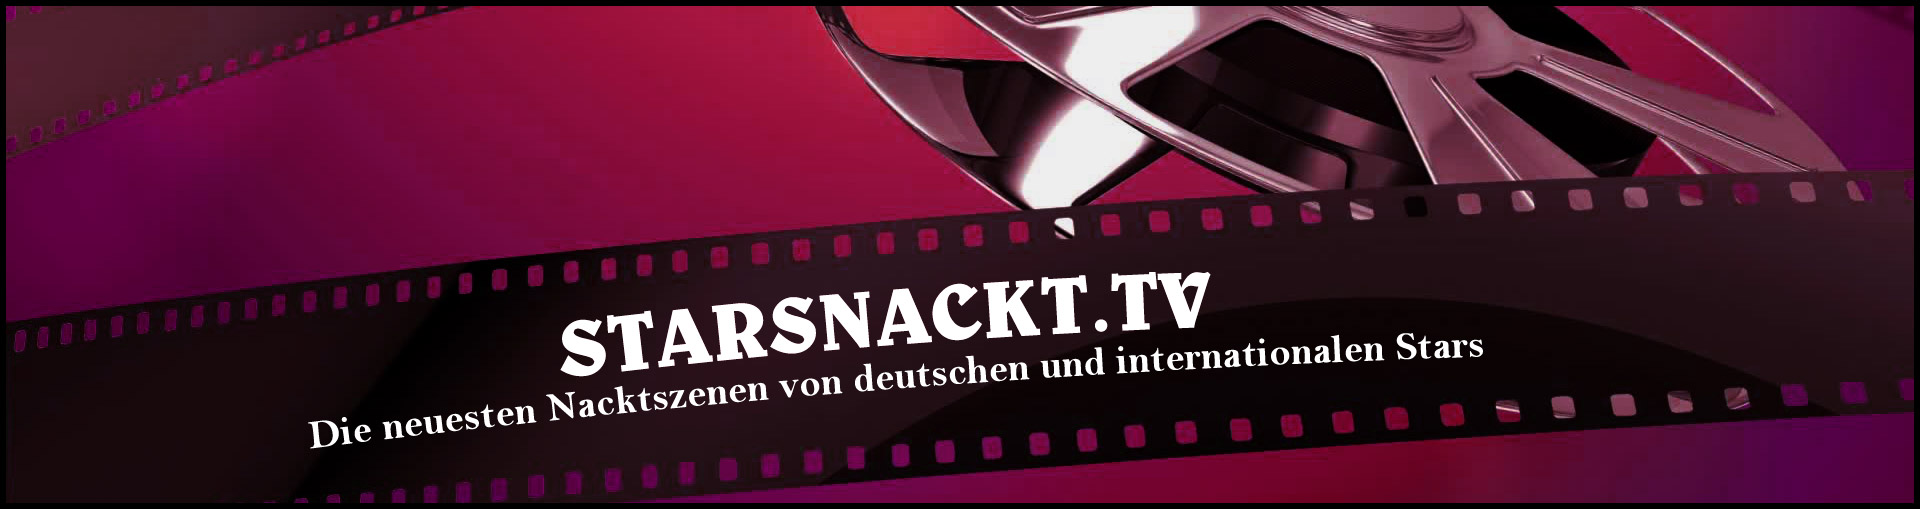 Starsnackt.tv